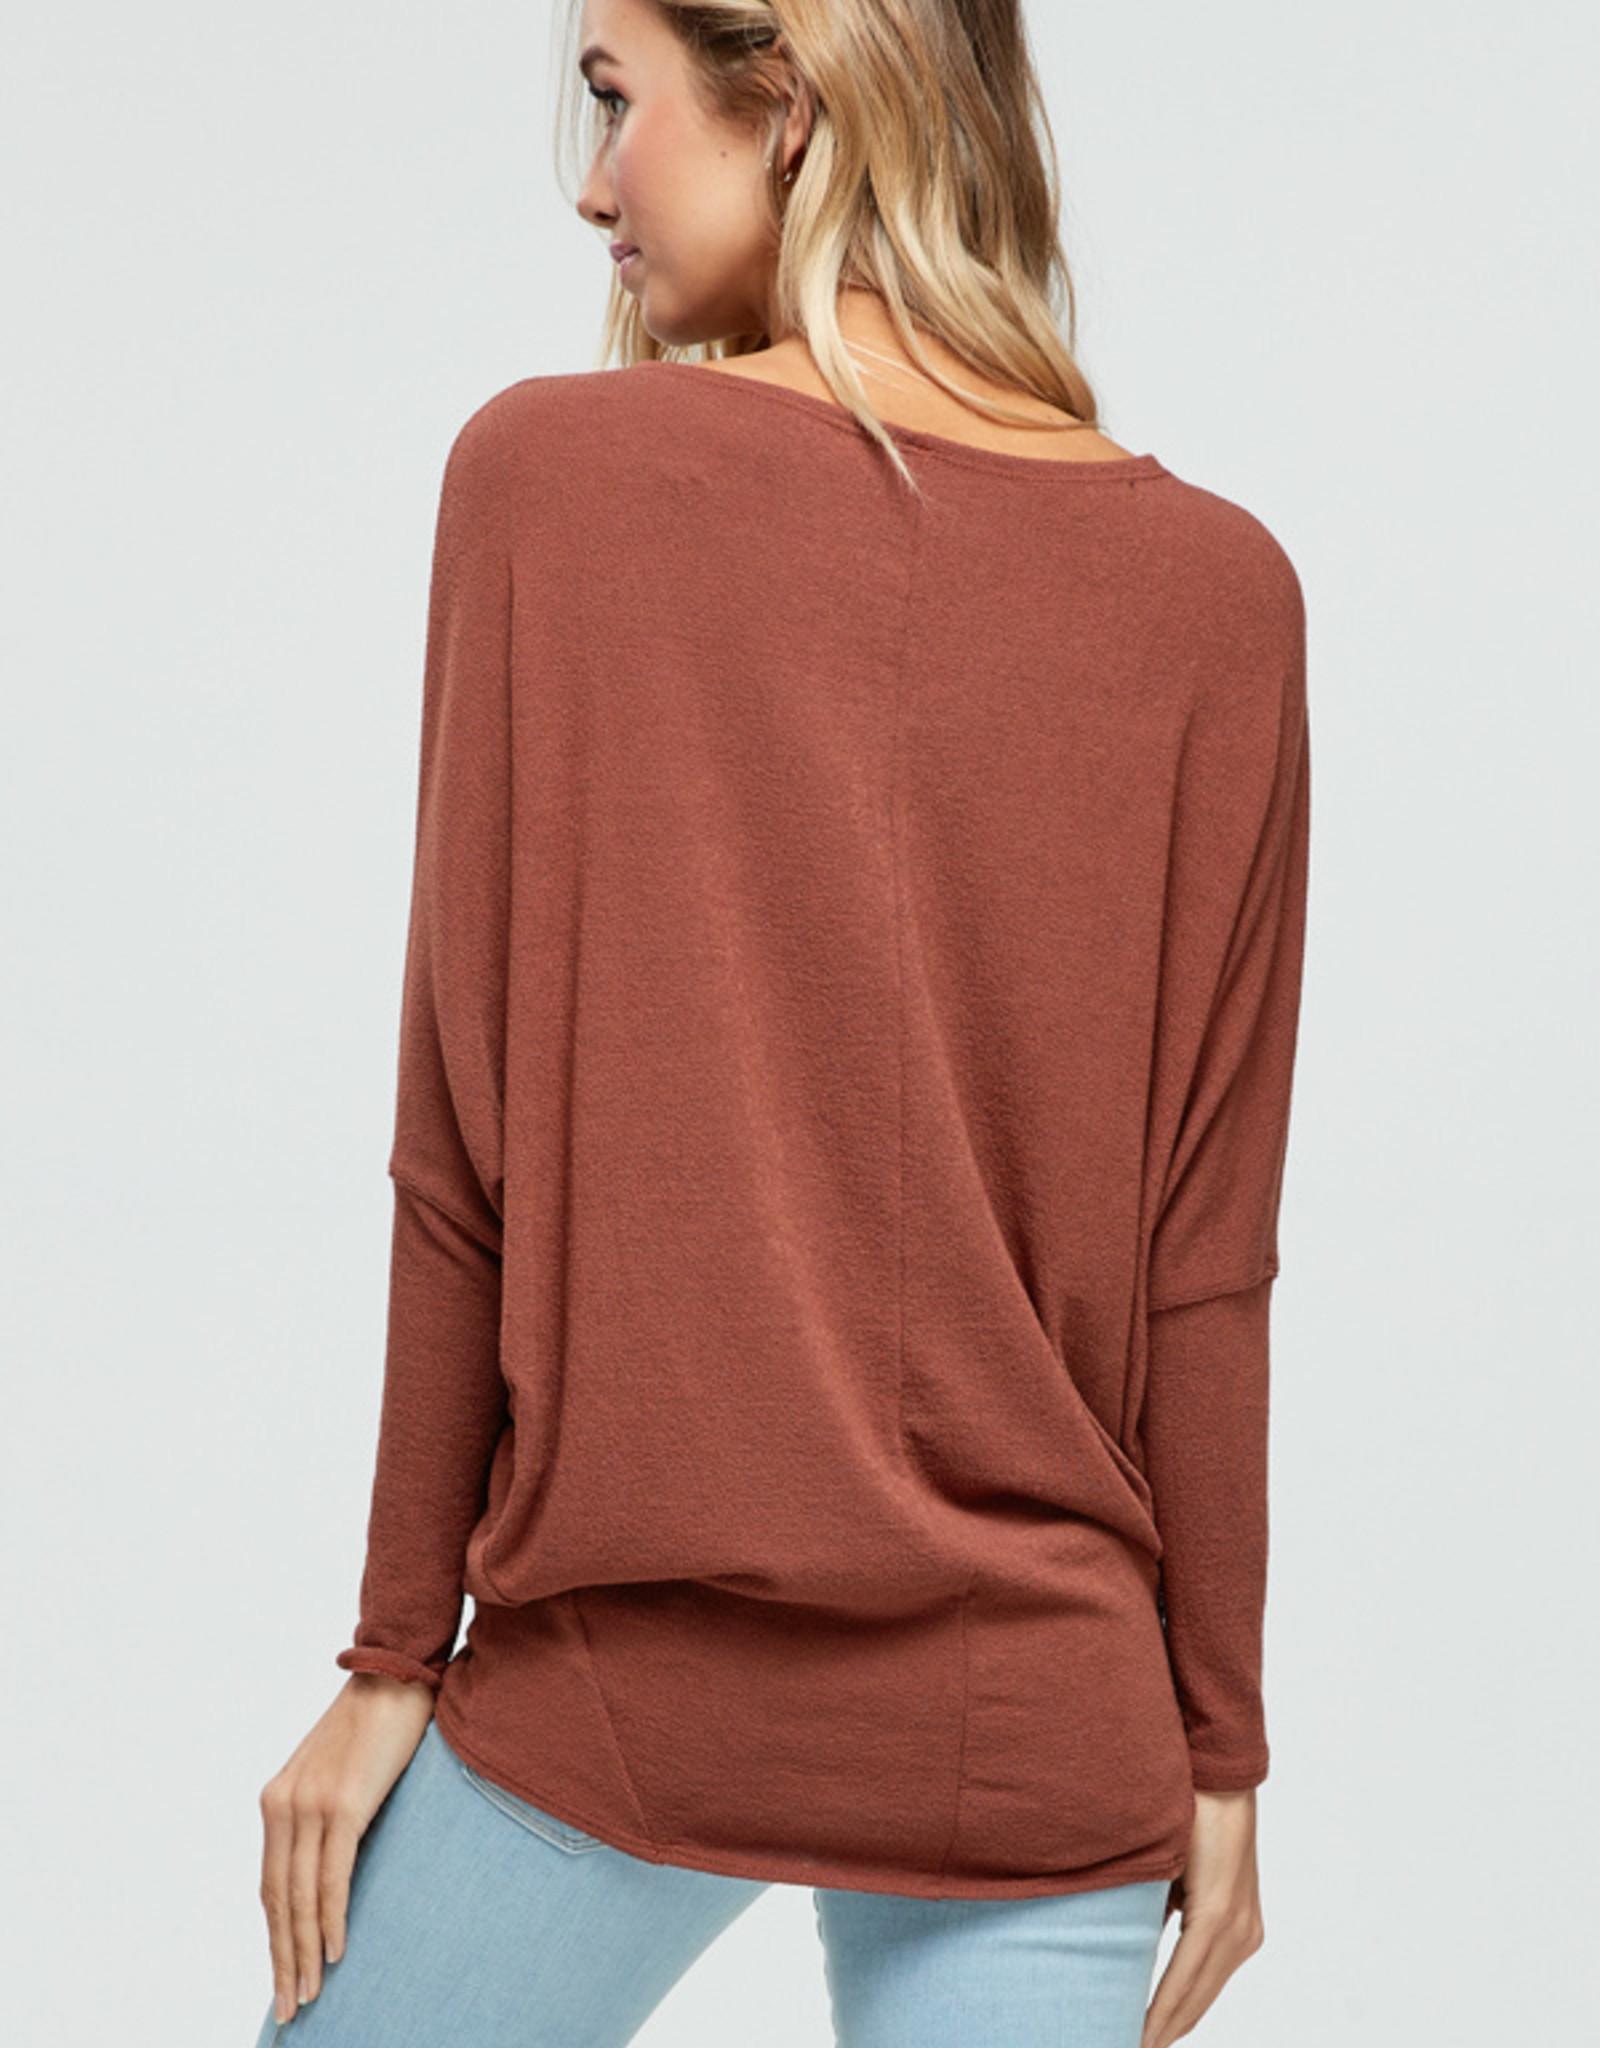 Jolie Off Shoulder Dolman Sleeve Tunic